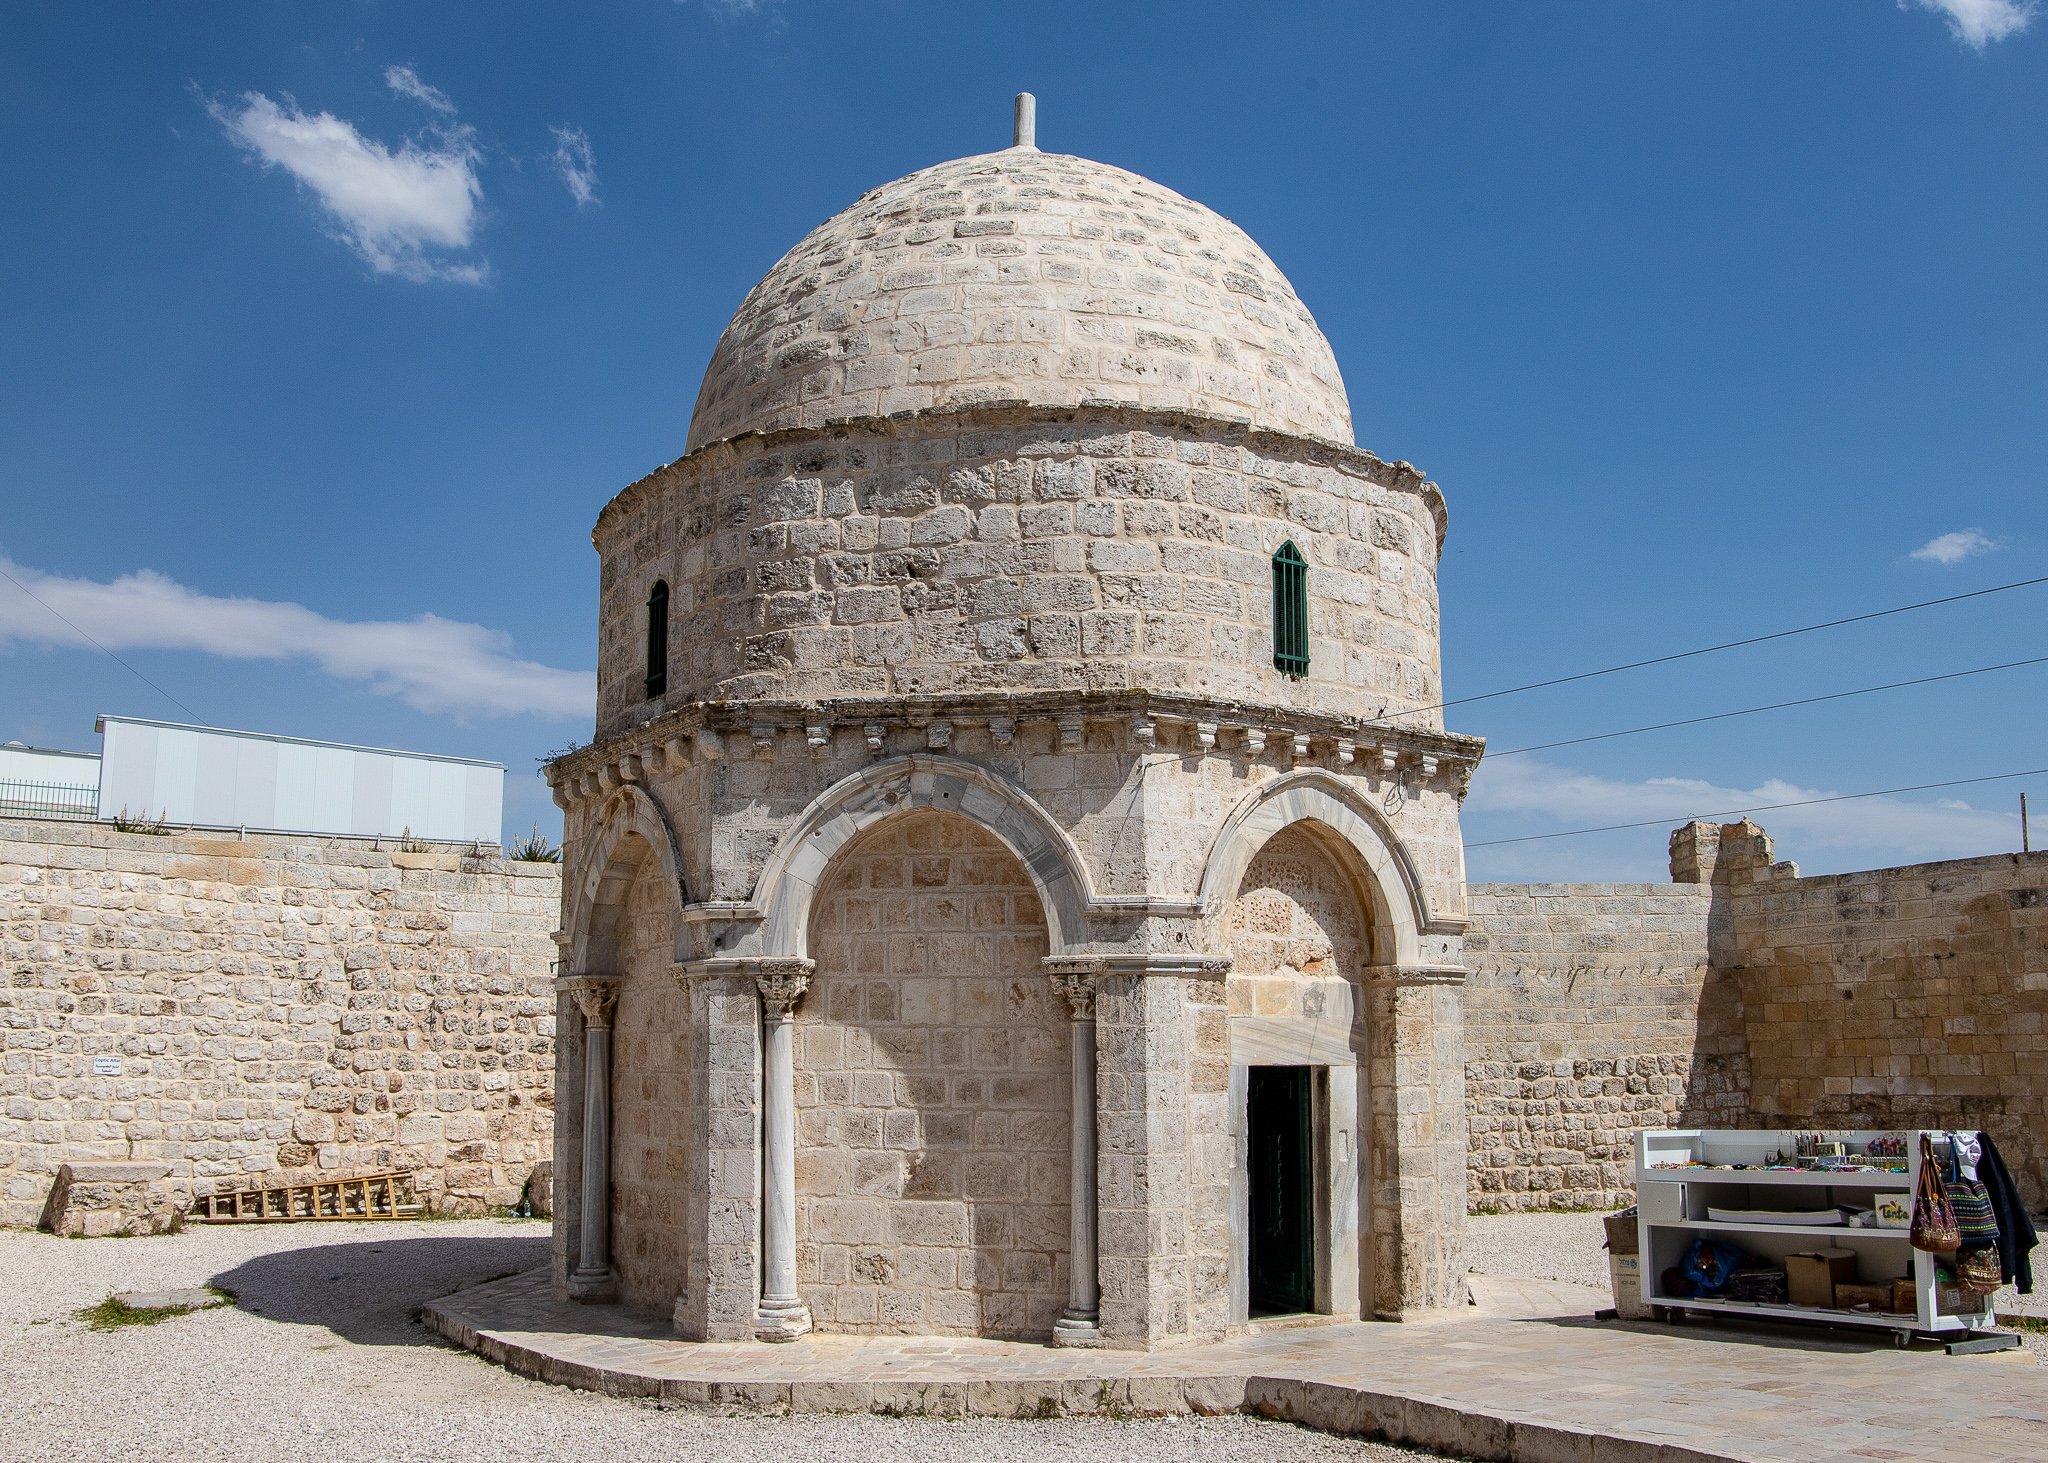 The octagonal Chapel